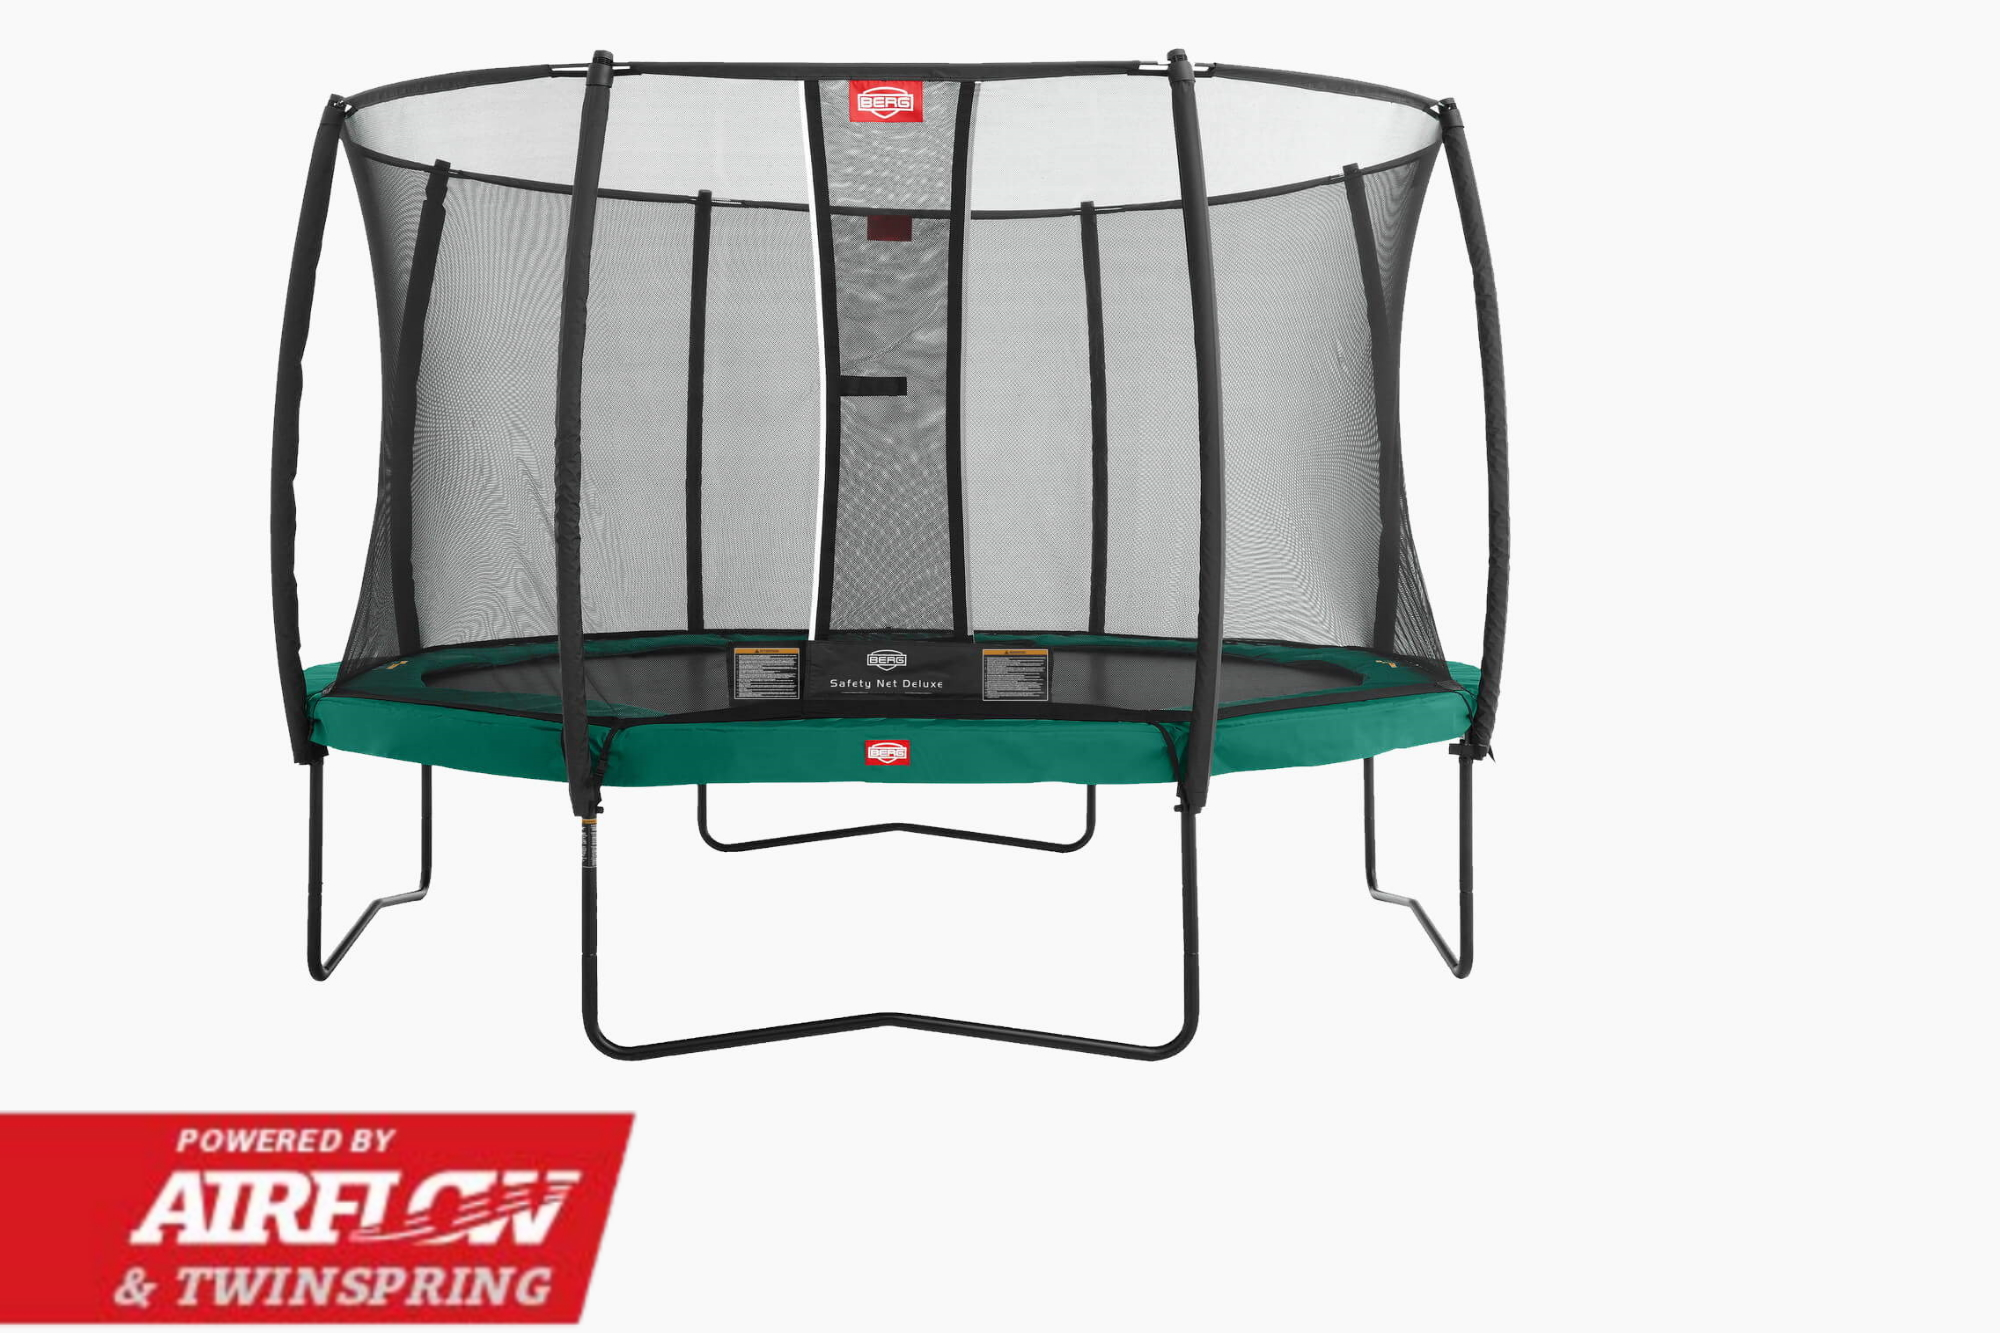 BERG Champion regular trampoline